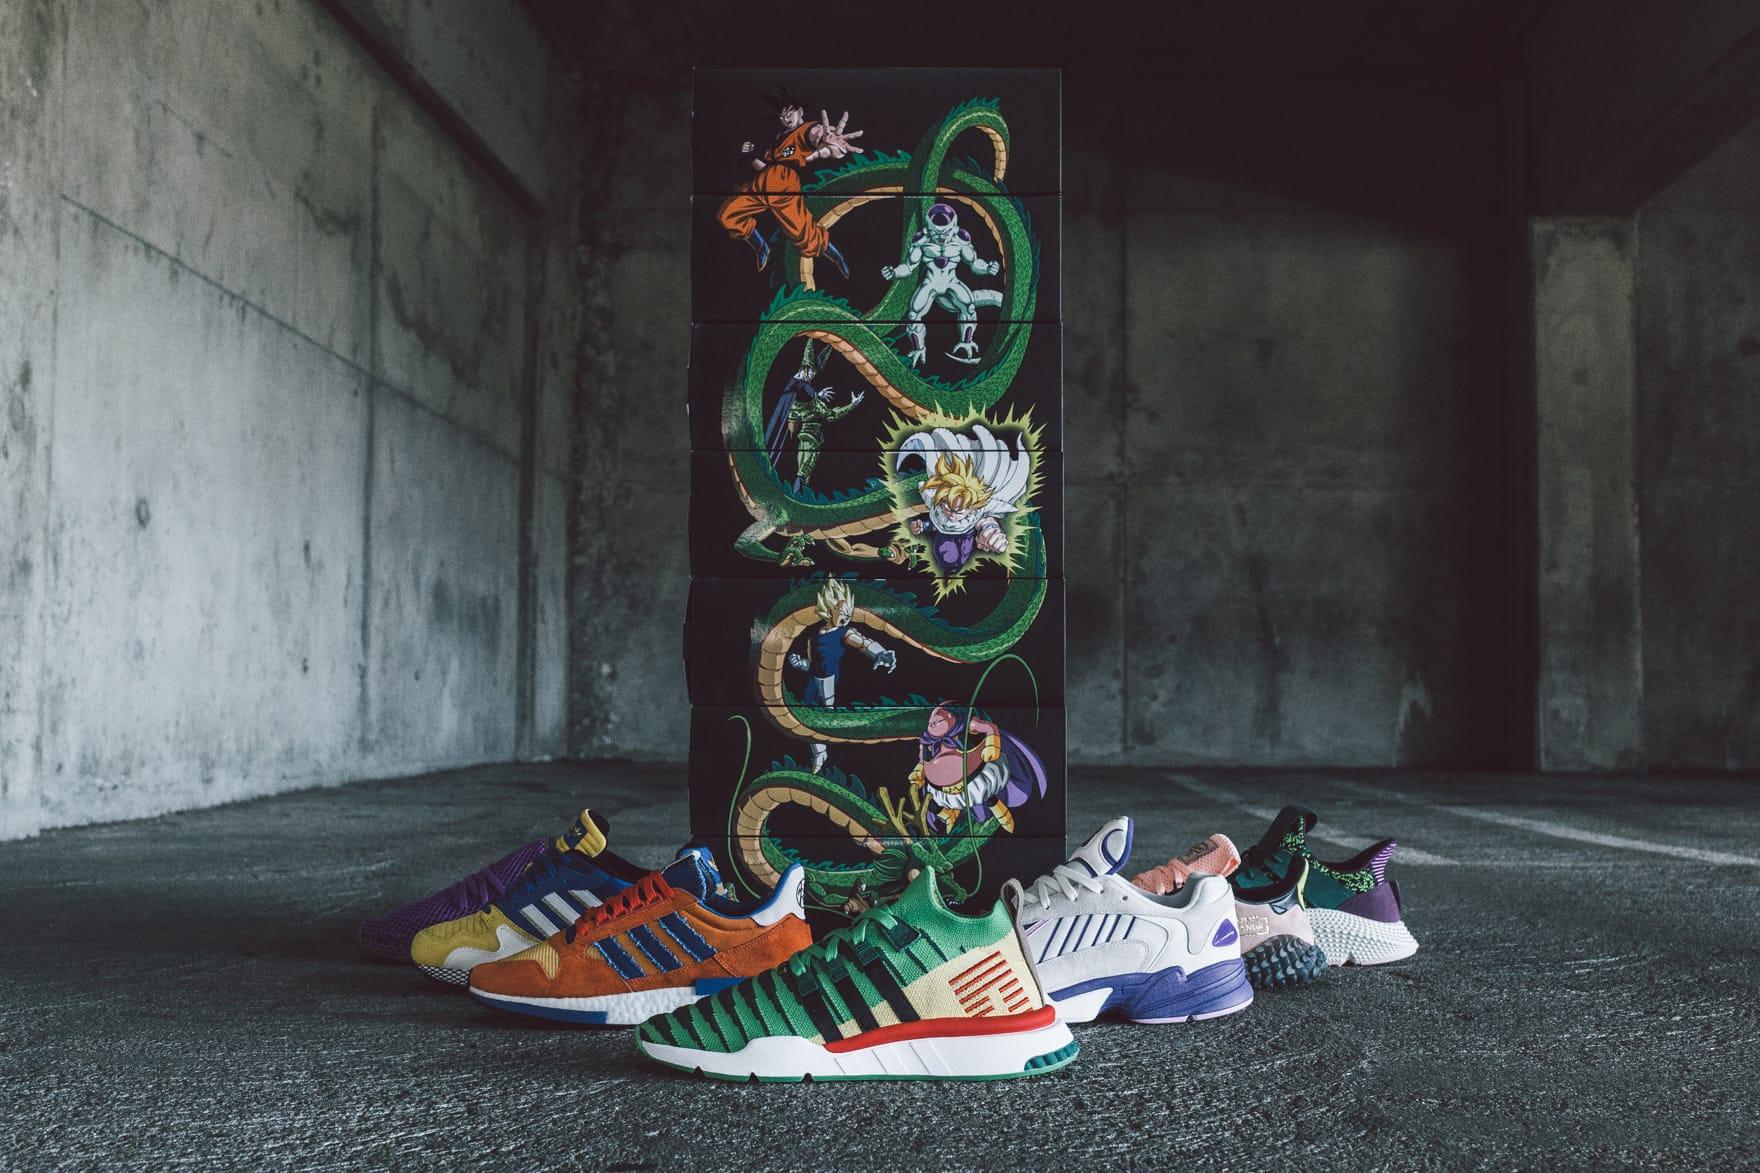 Dragon Ball Z' x adidas Full Collection